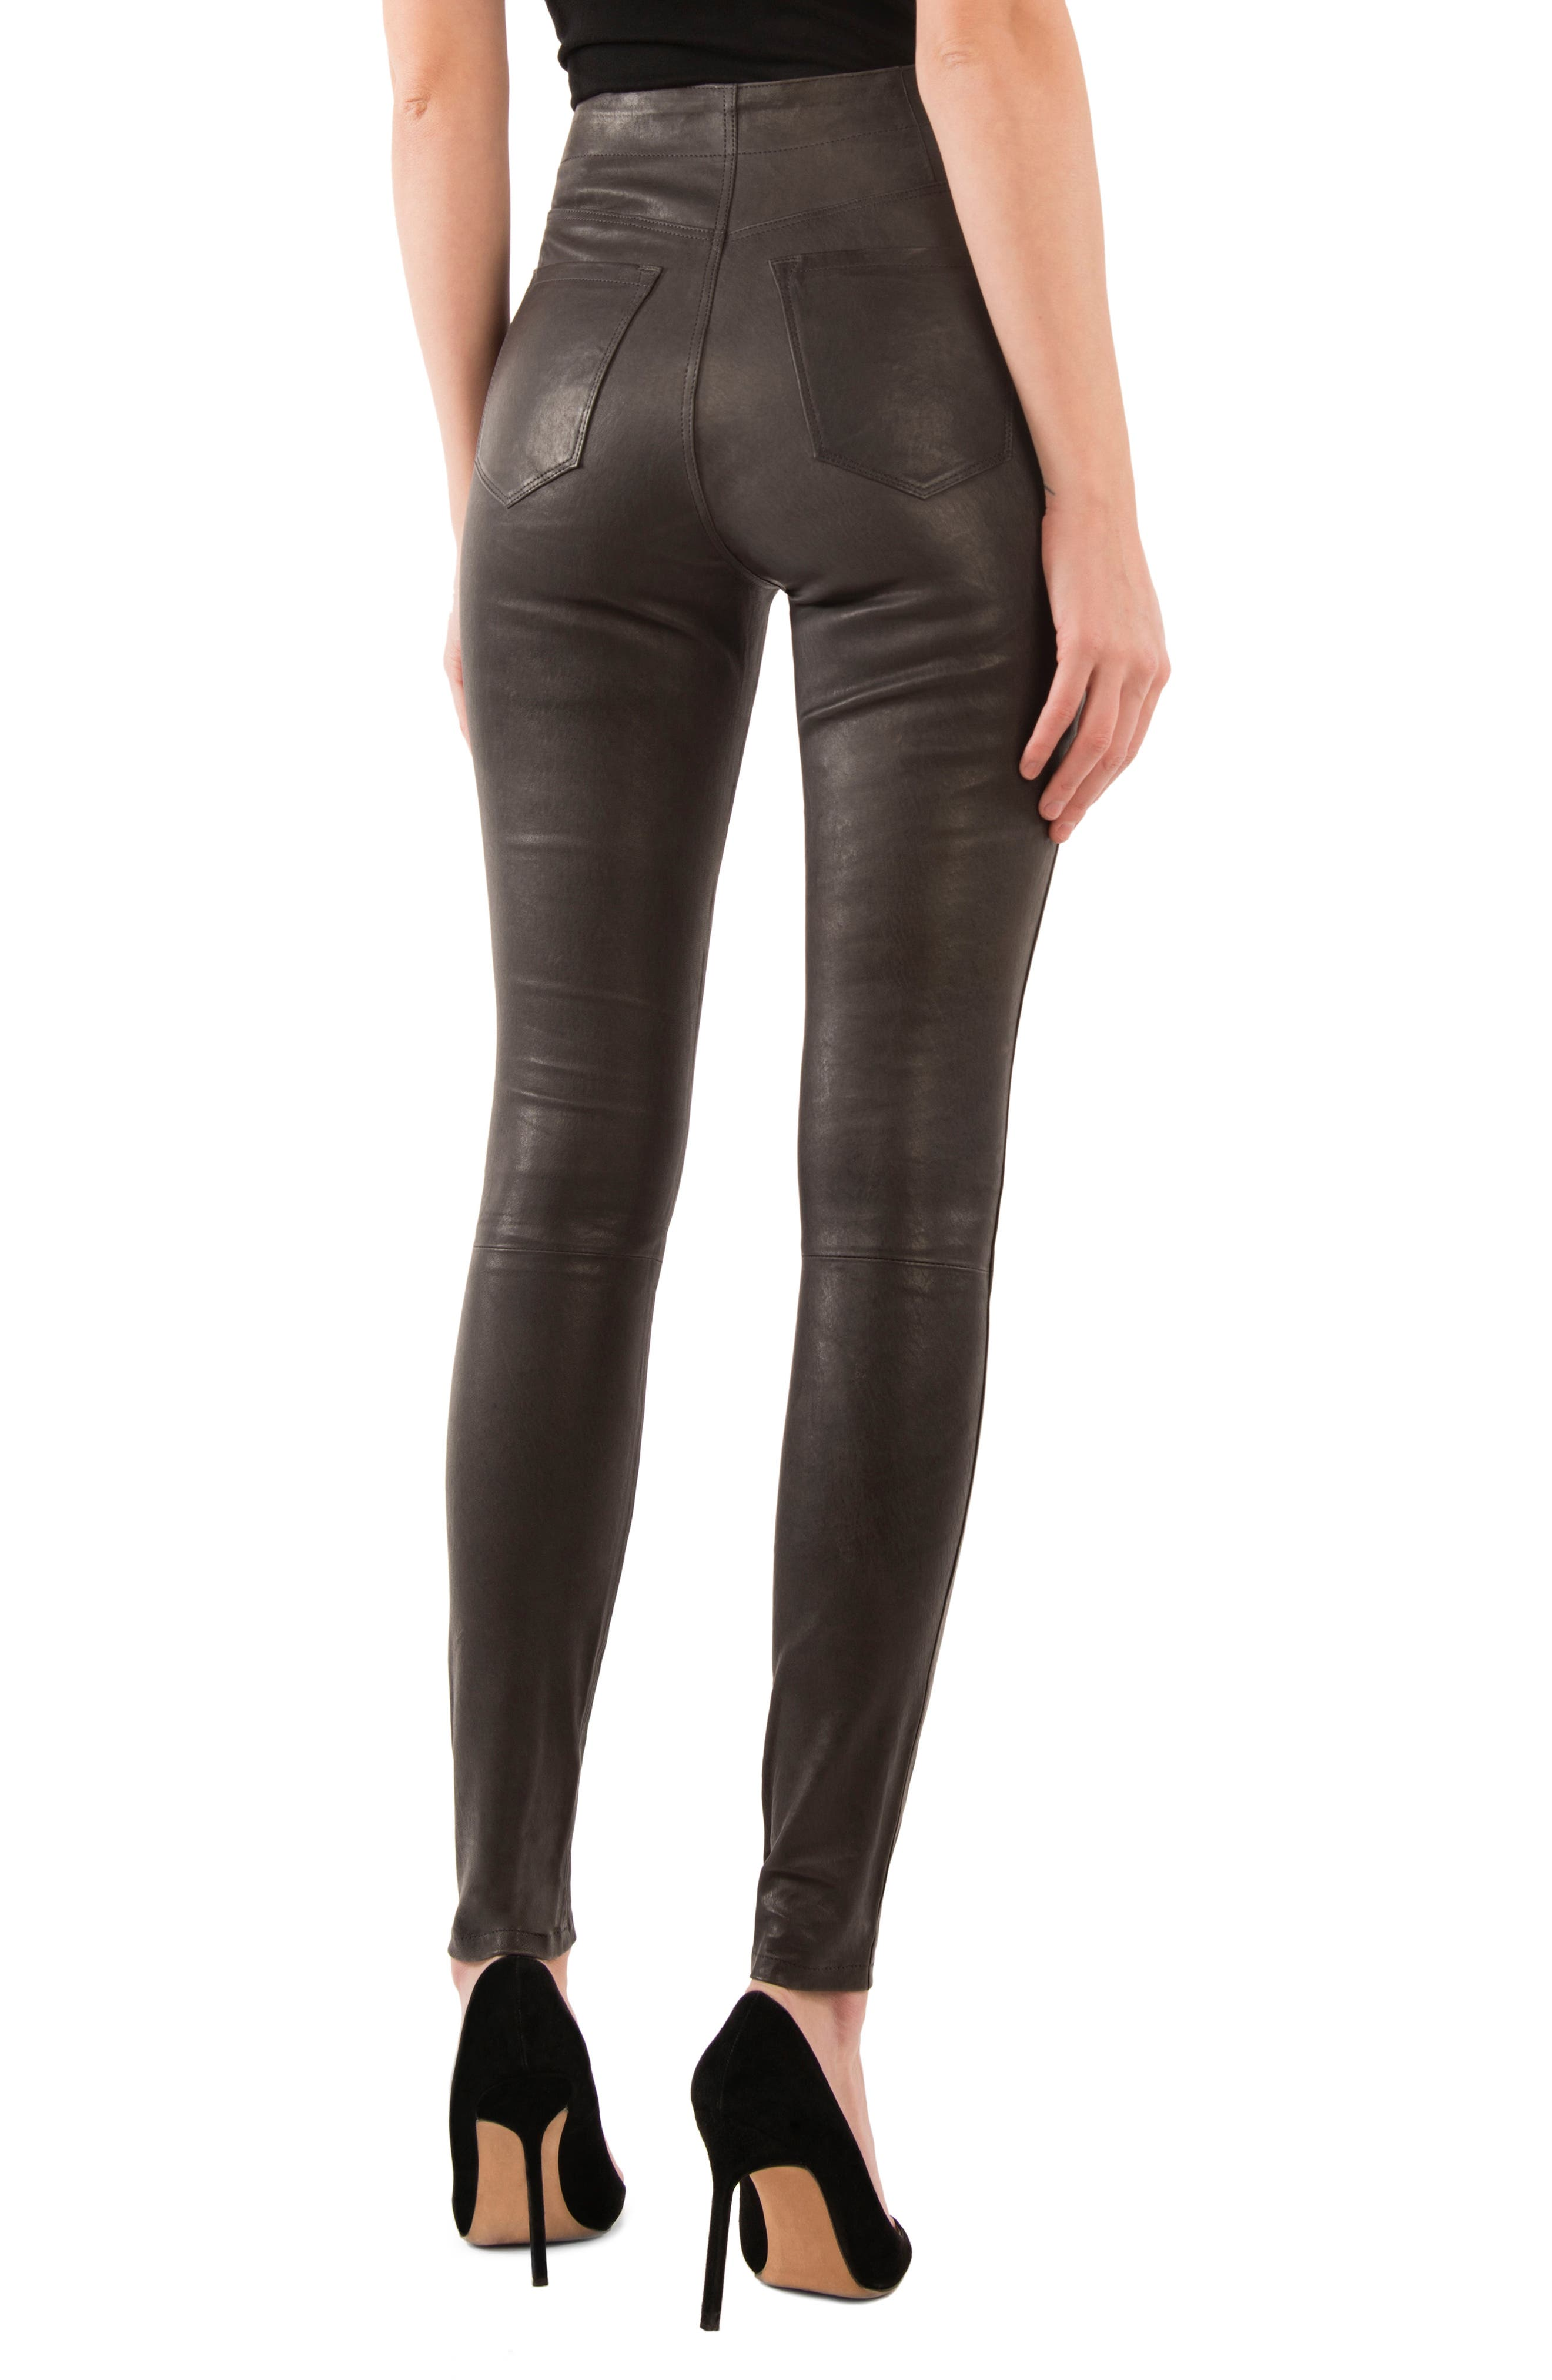 Natasha High Waist Skinny Leather Pants,                             Alternate thumbnail 2, color,                             039